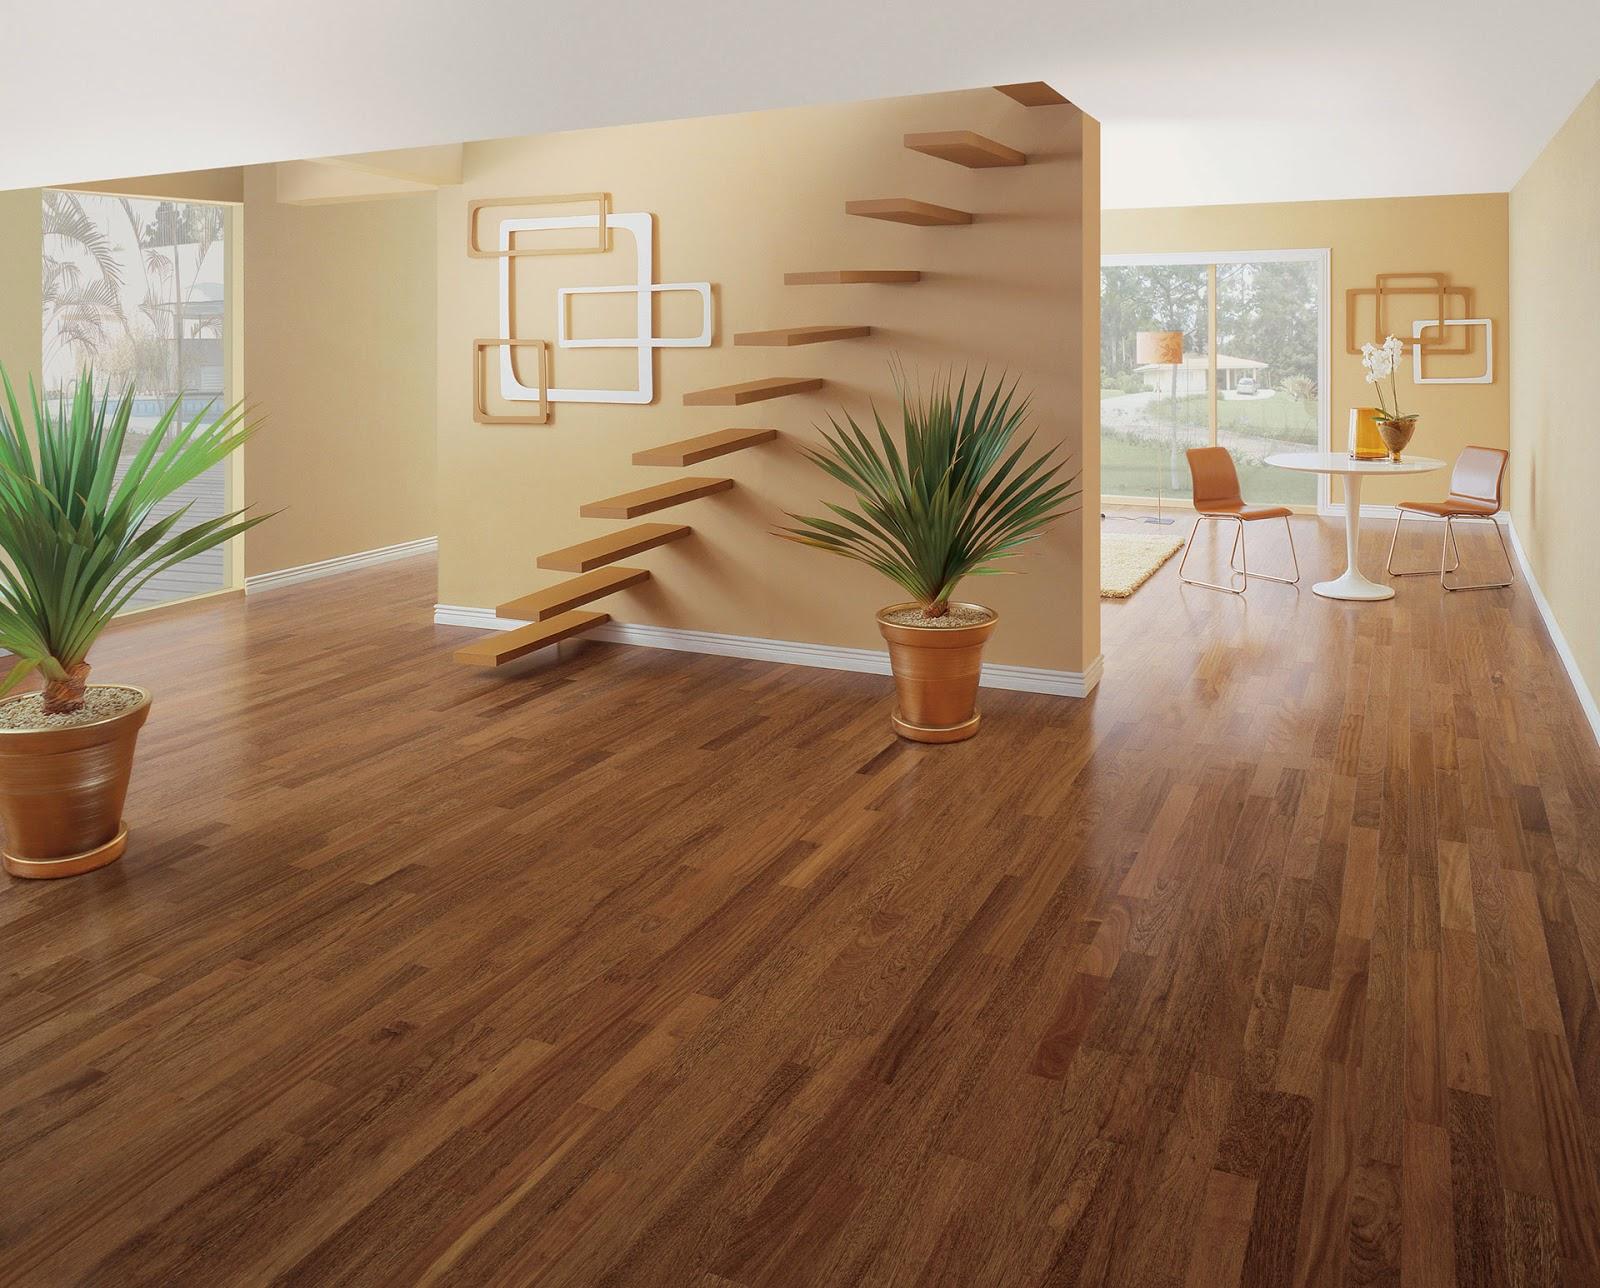 Pisos laminados mexico d f piso laminado tonos madera for Pisos ceramicos de madera